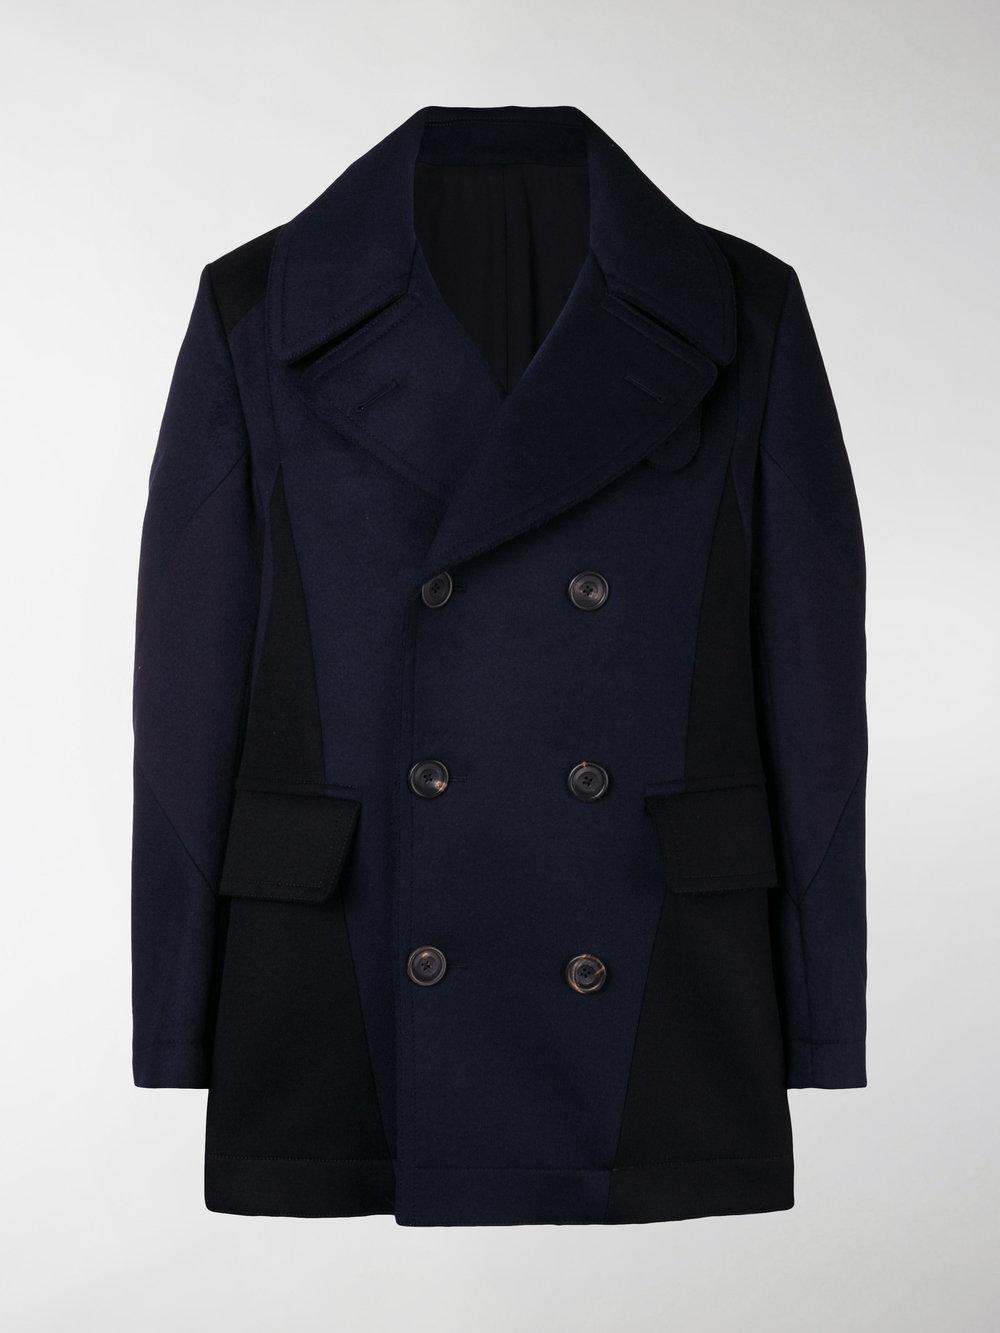 542cdaa1d4b5 Lyst - Alexander Mcqueen Double Breasted Coat in Blue for Men